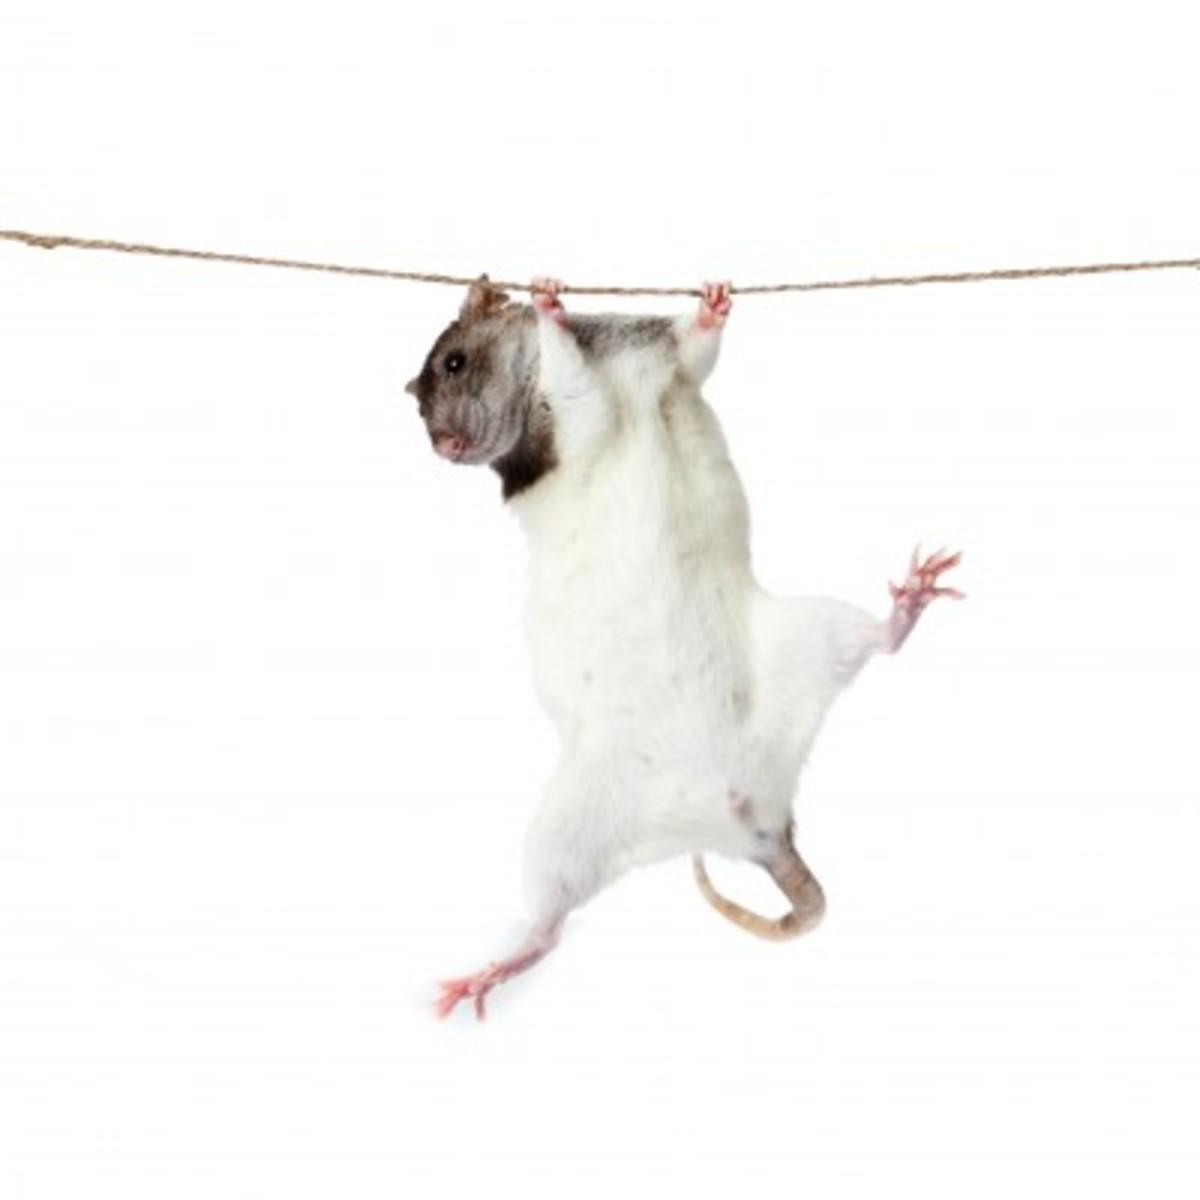 Rats Love to Climb!